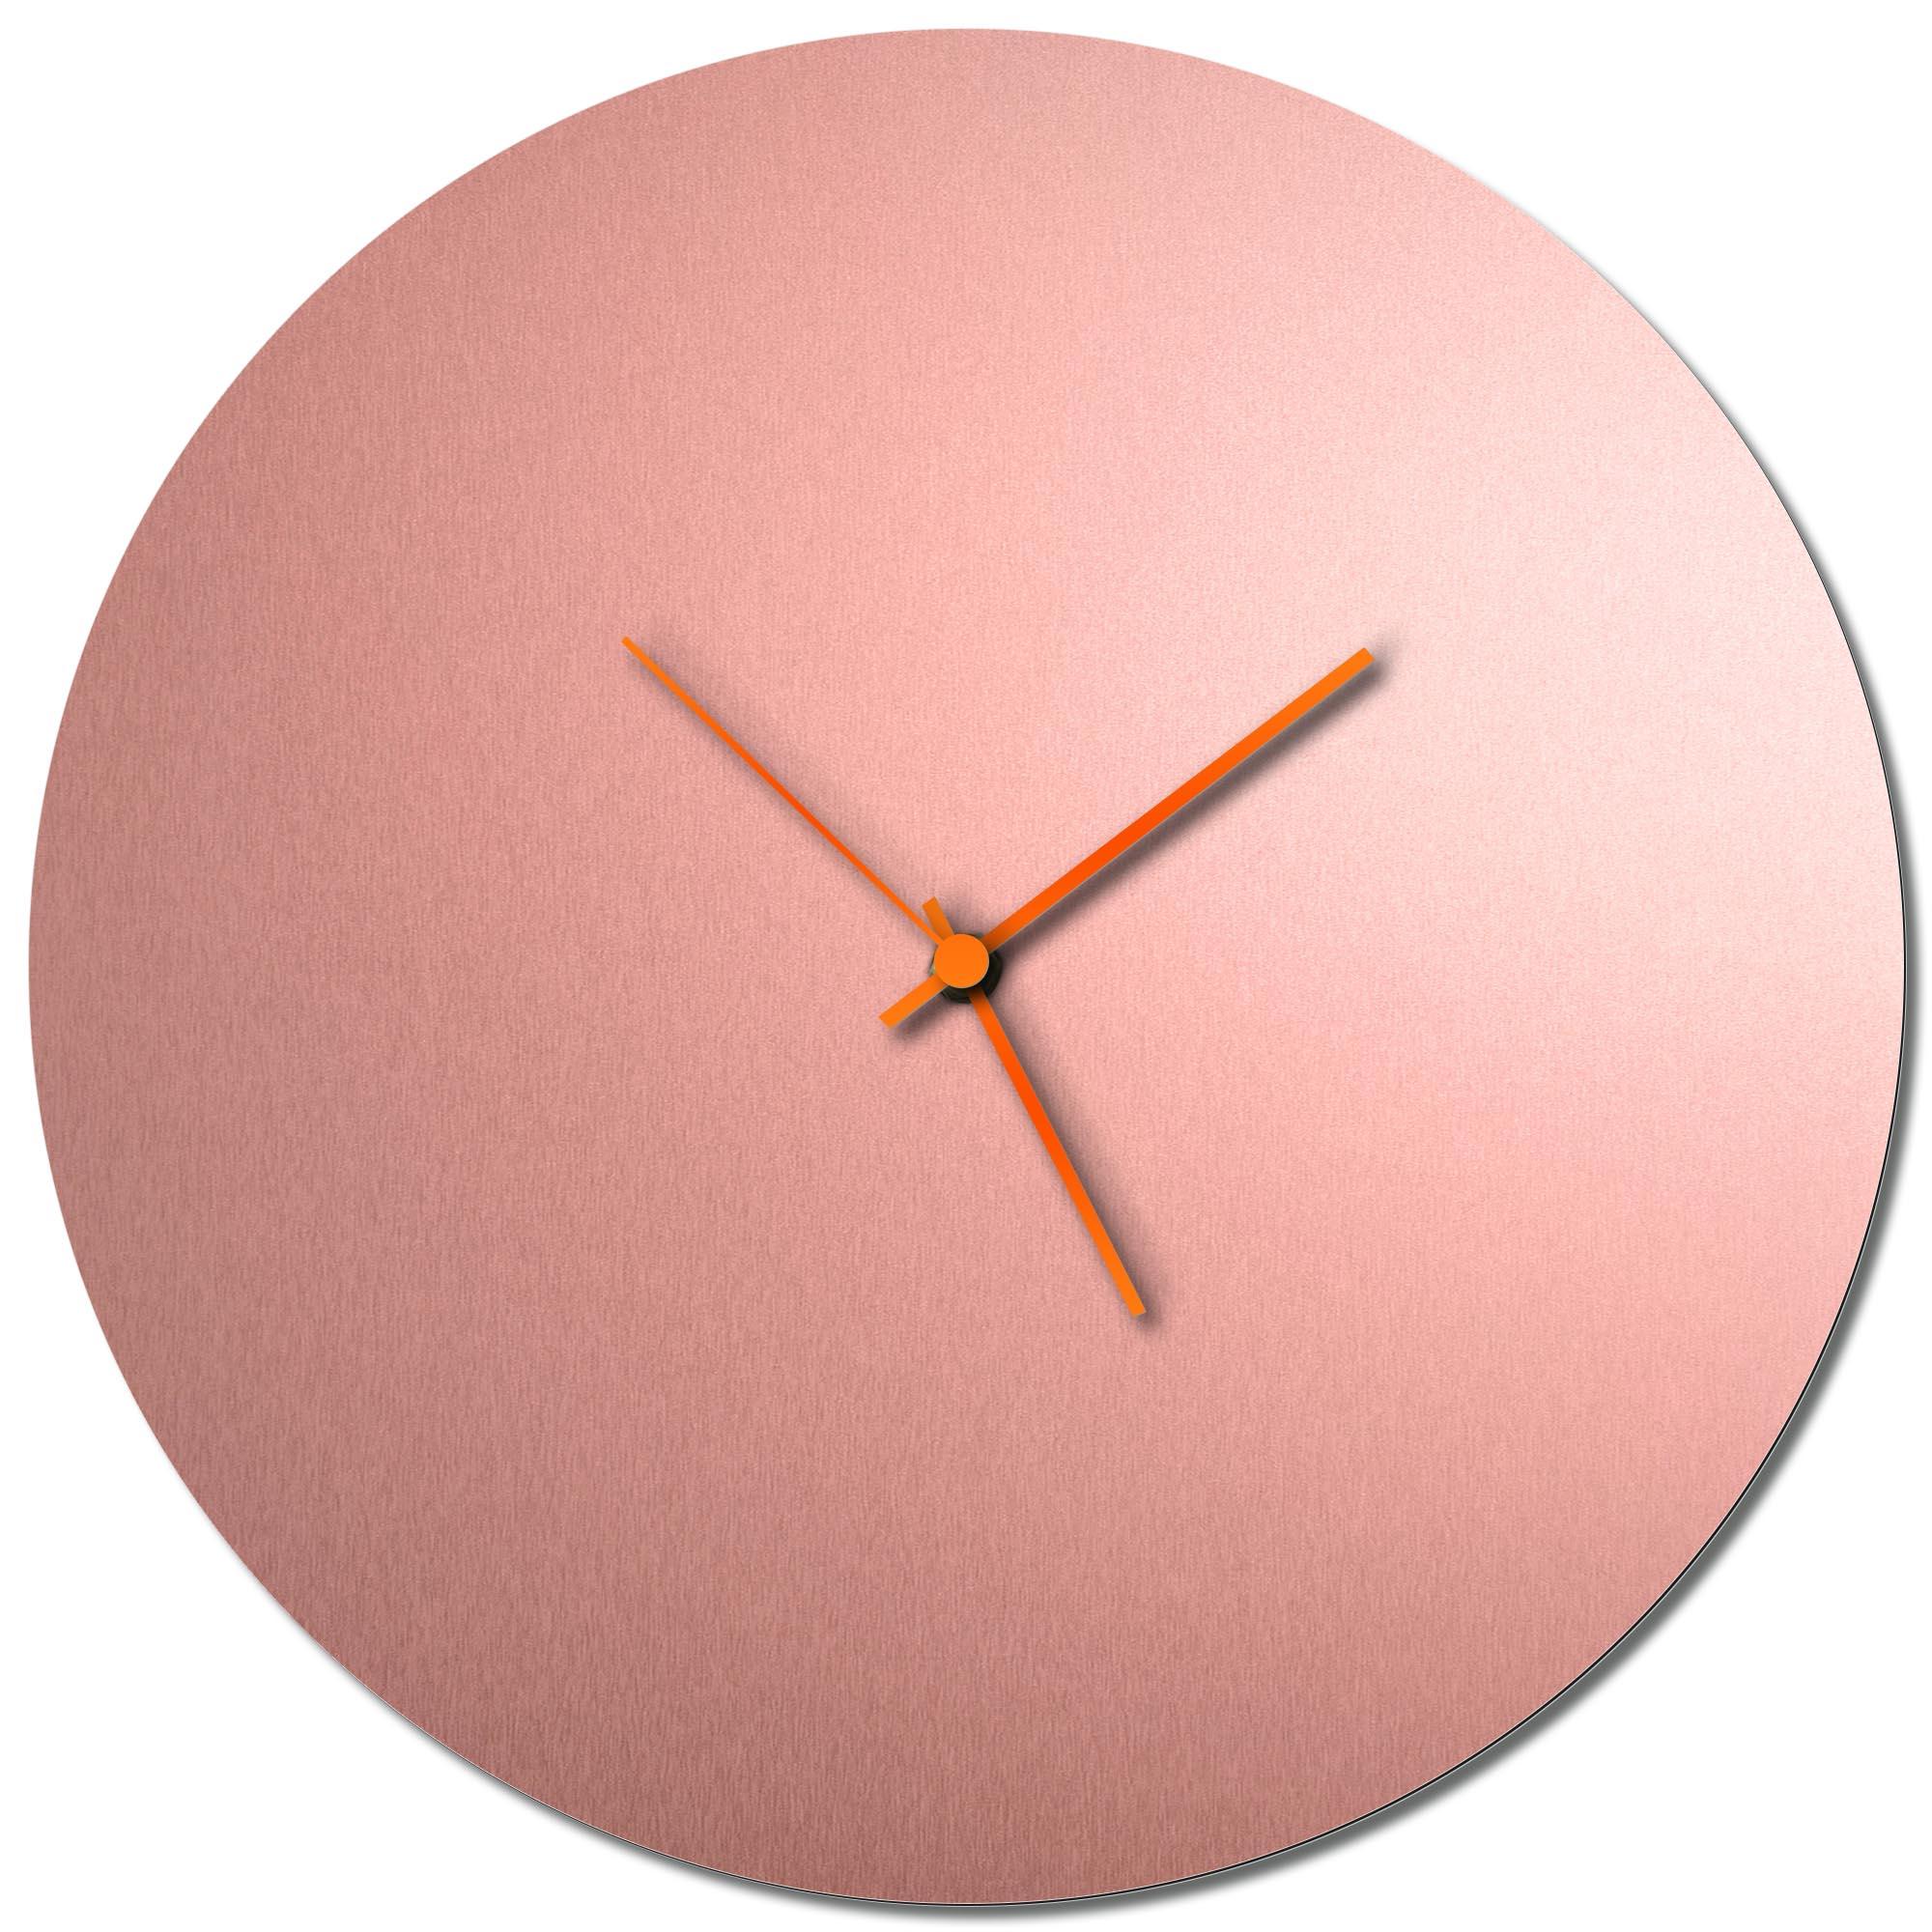 Adam Schwoeppe 'Coppersmith Circle Clock Orange' Midcentury Modern Style Wall Clock